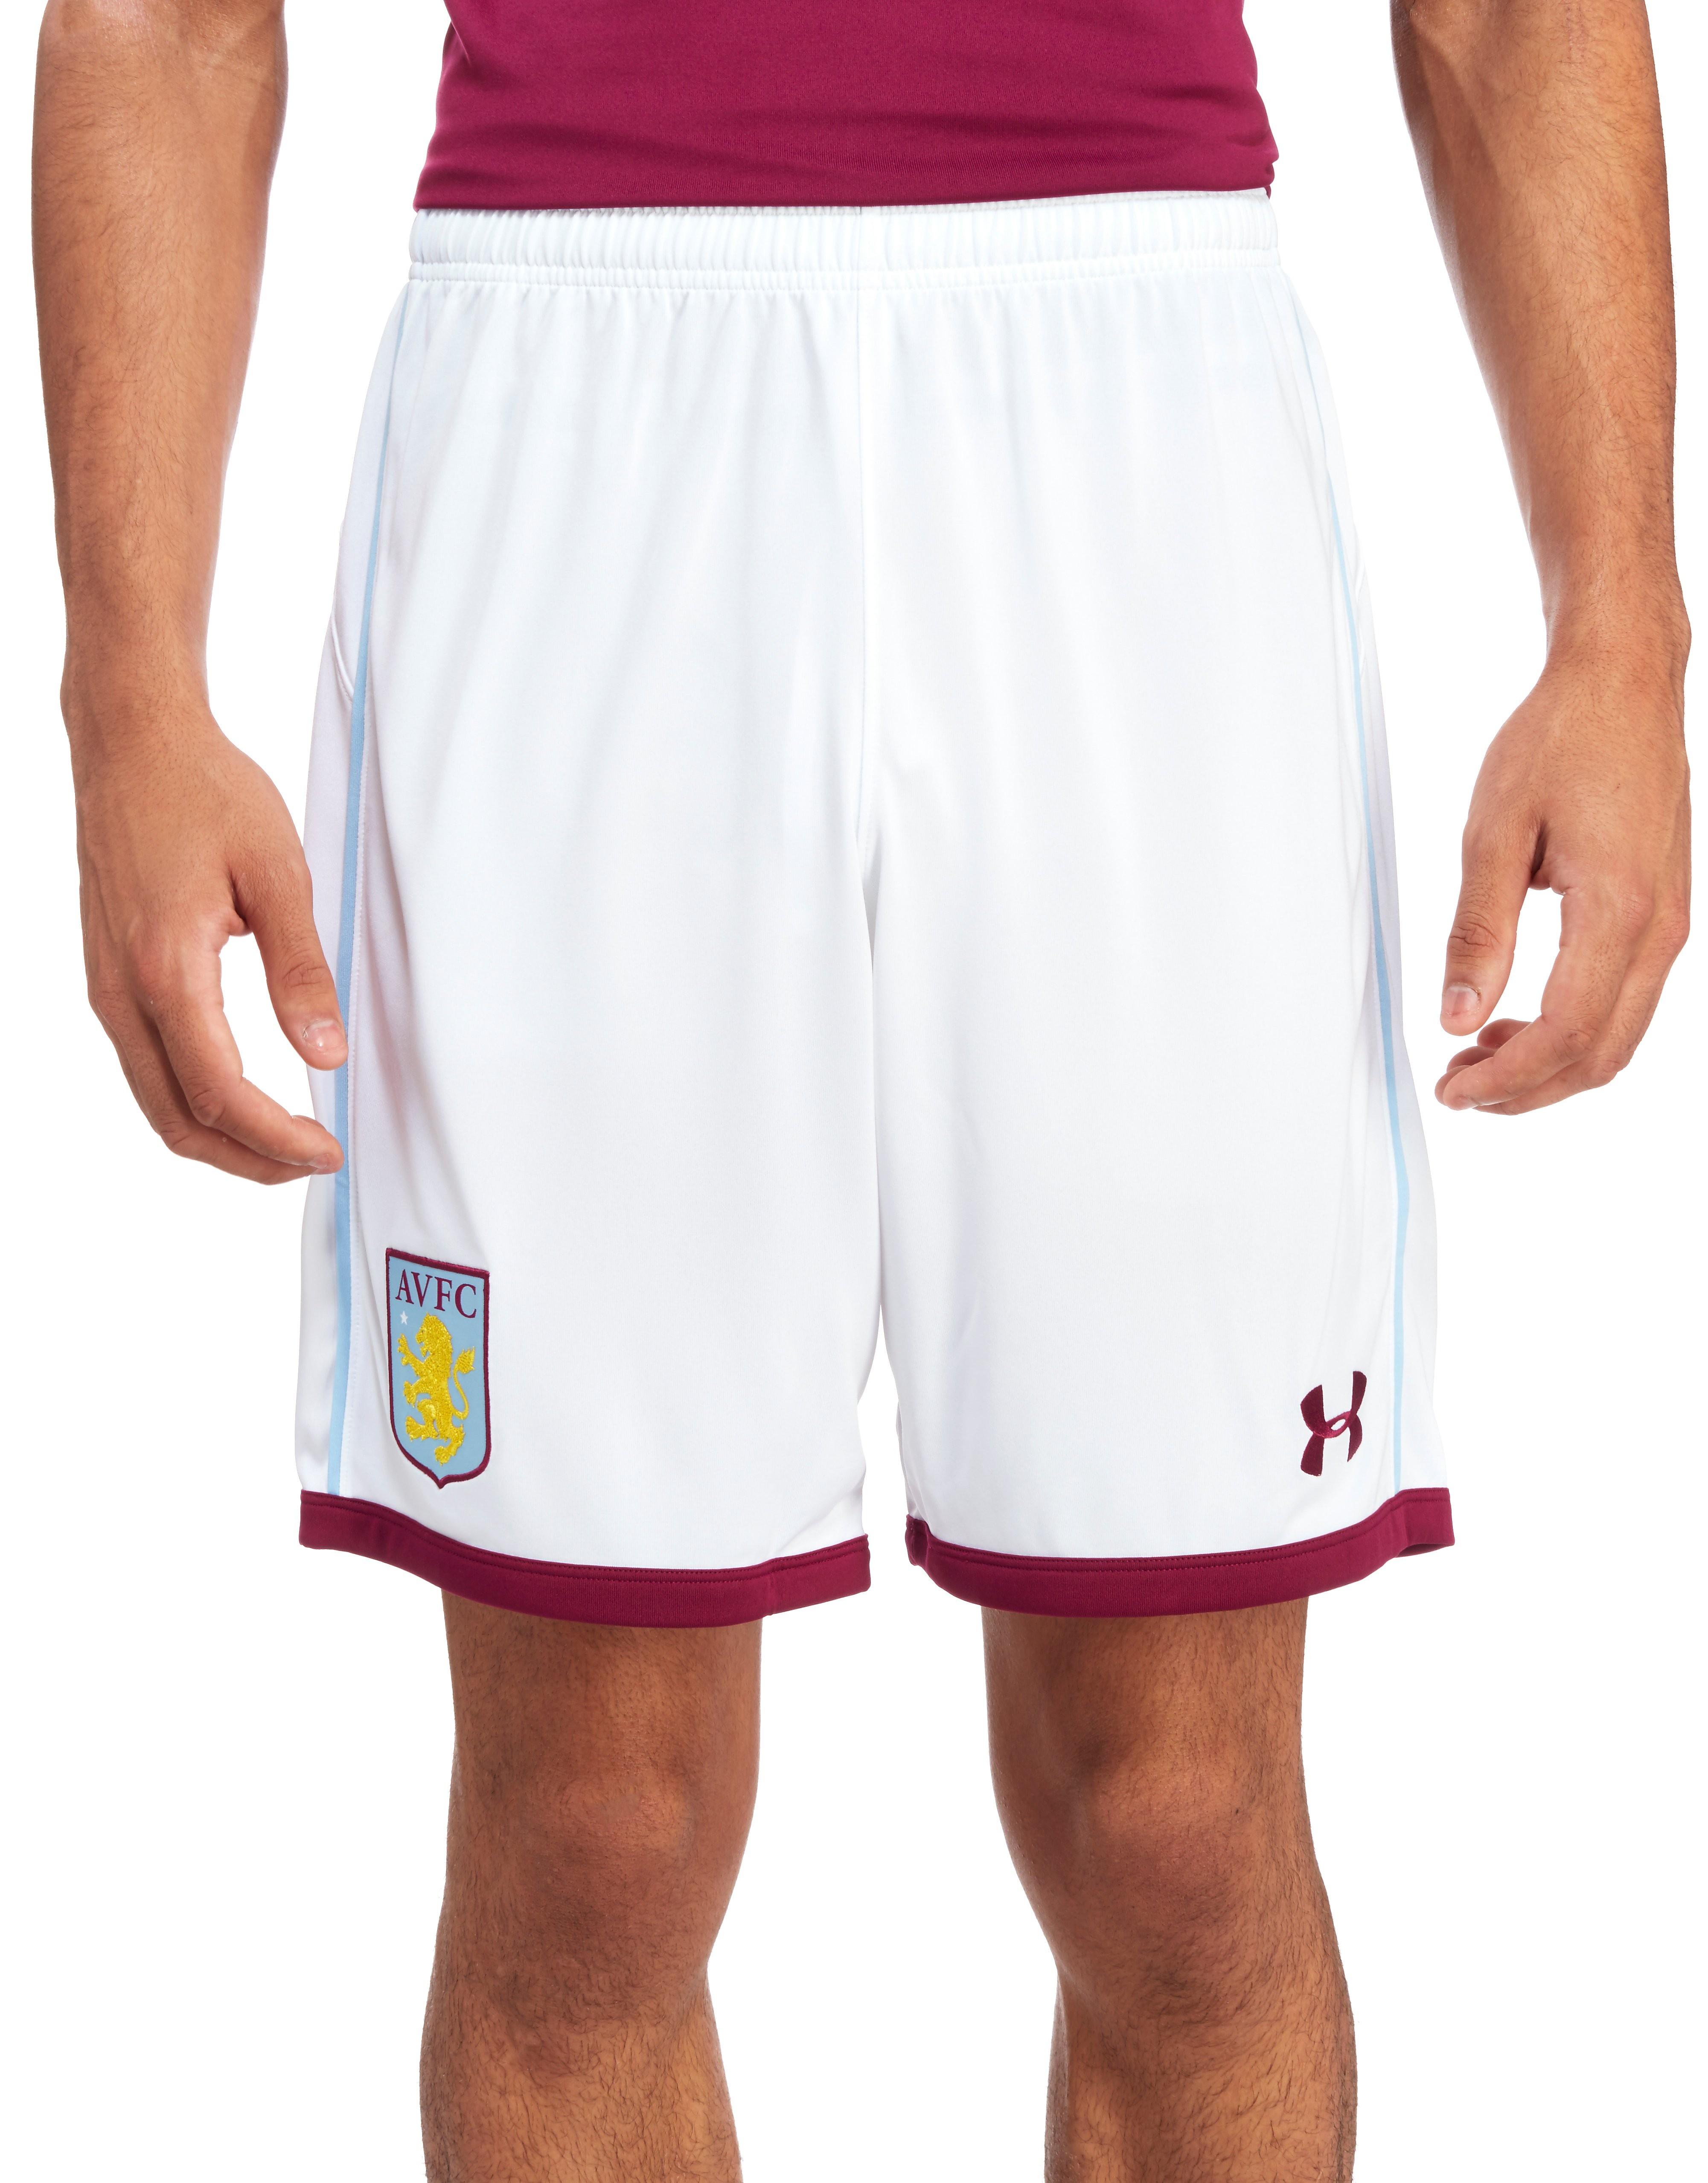 Under Armour Aston Villa FC 2016/17 Home Shorts